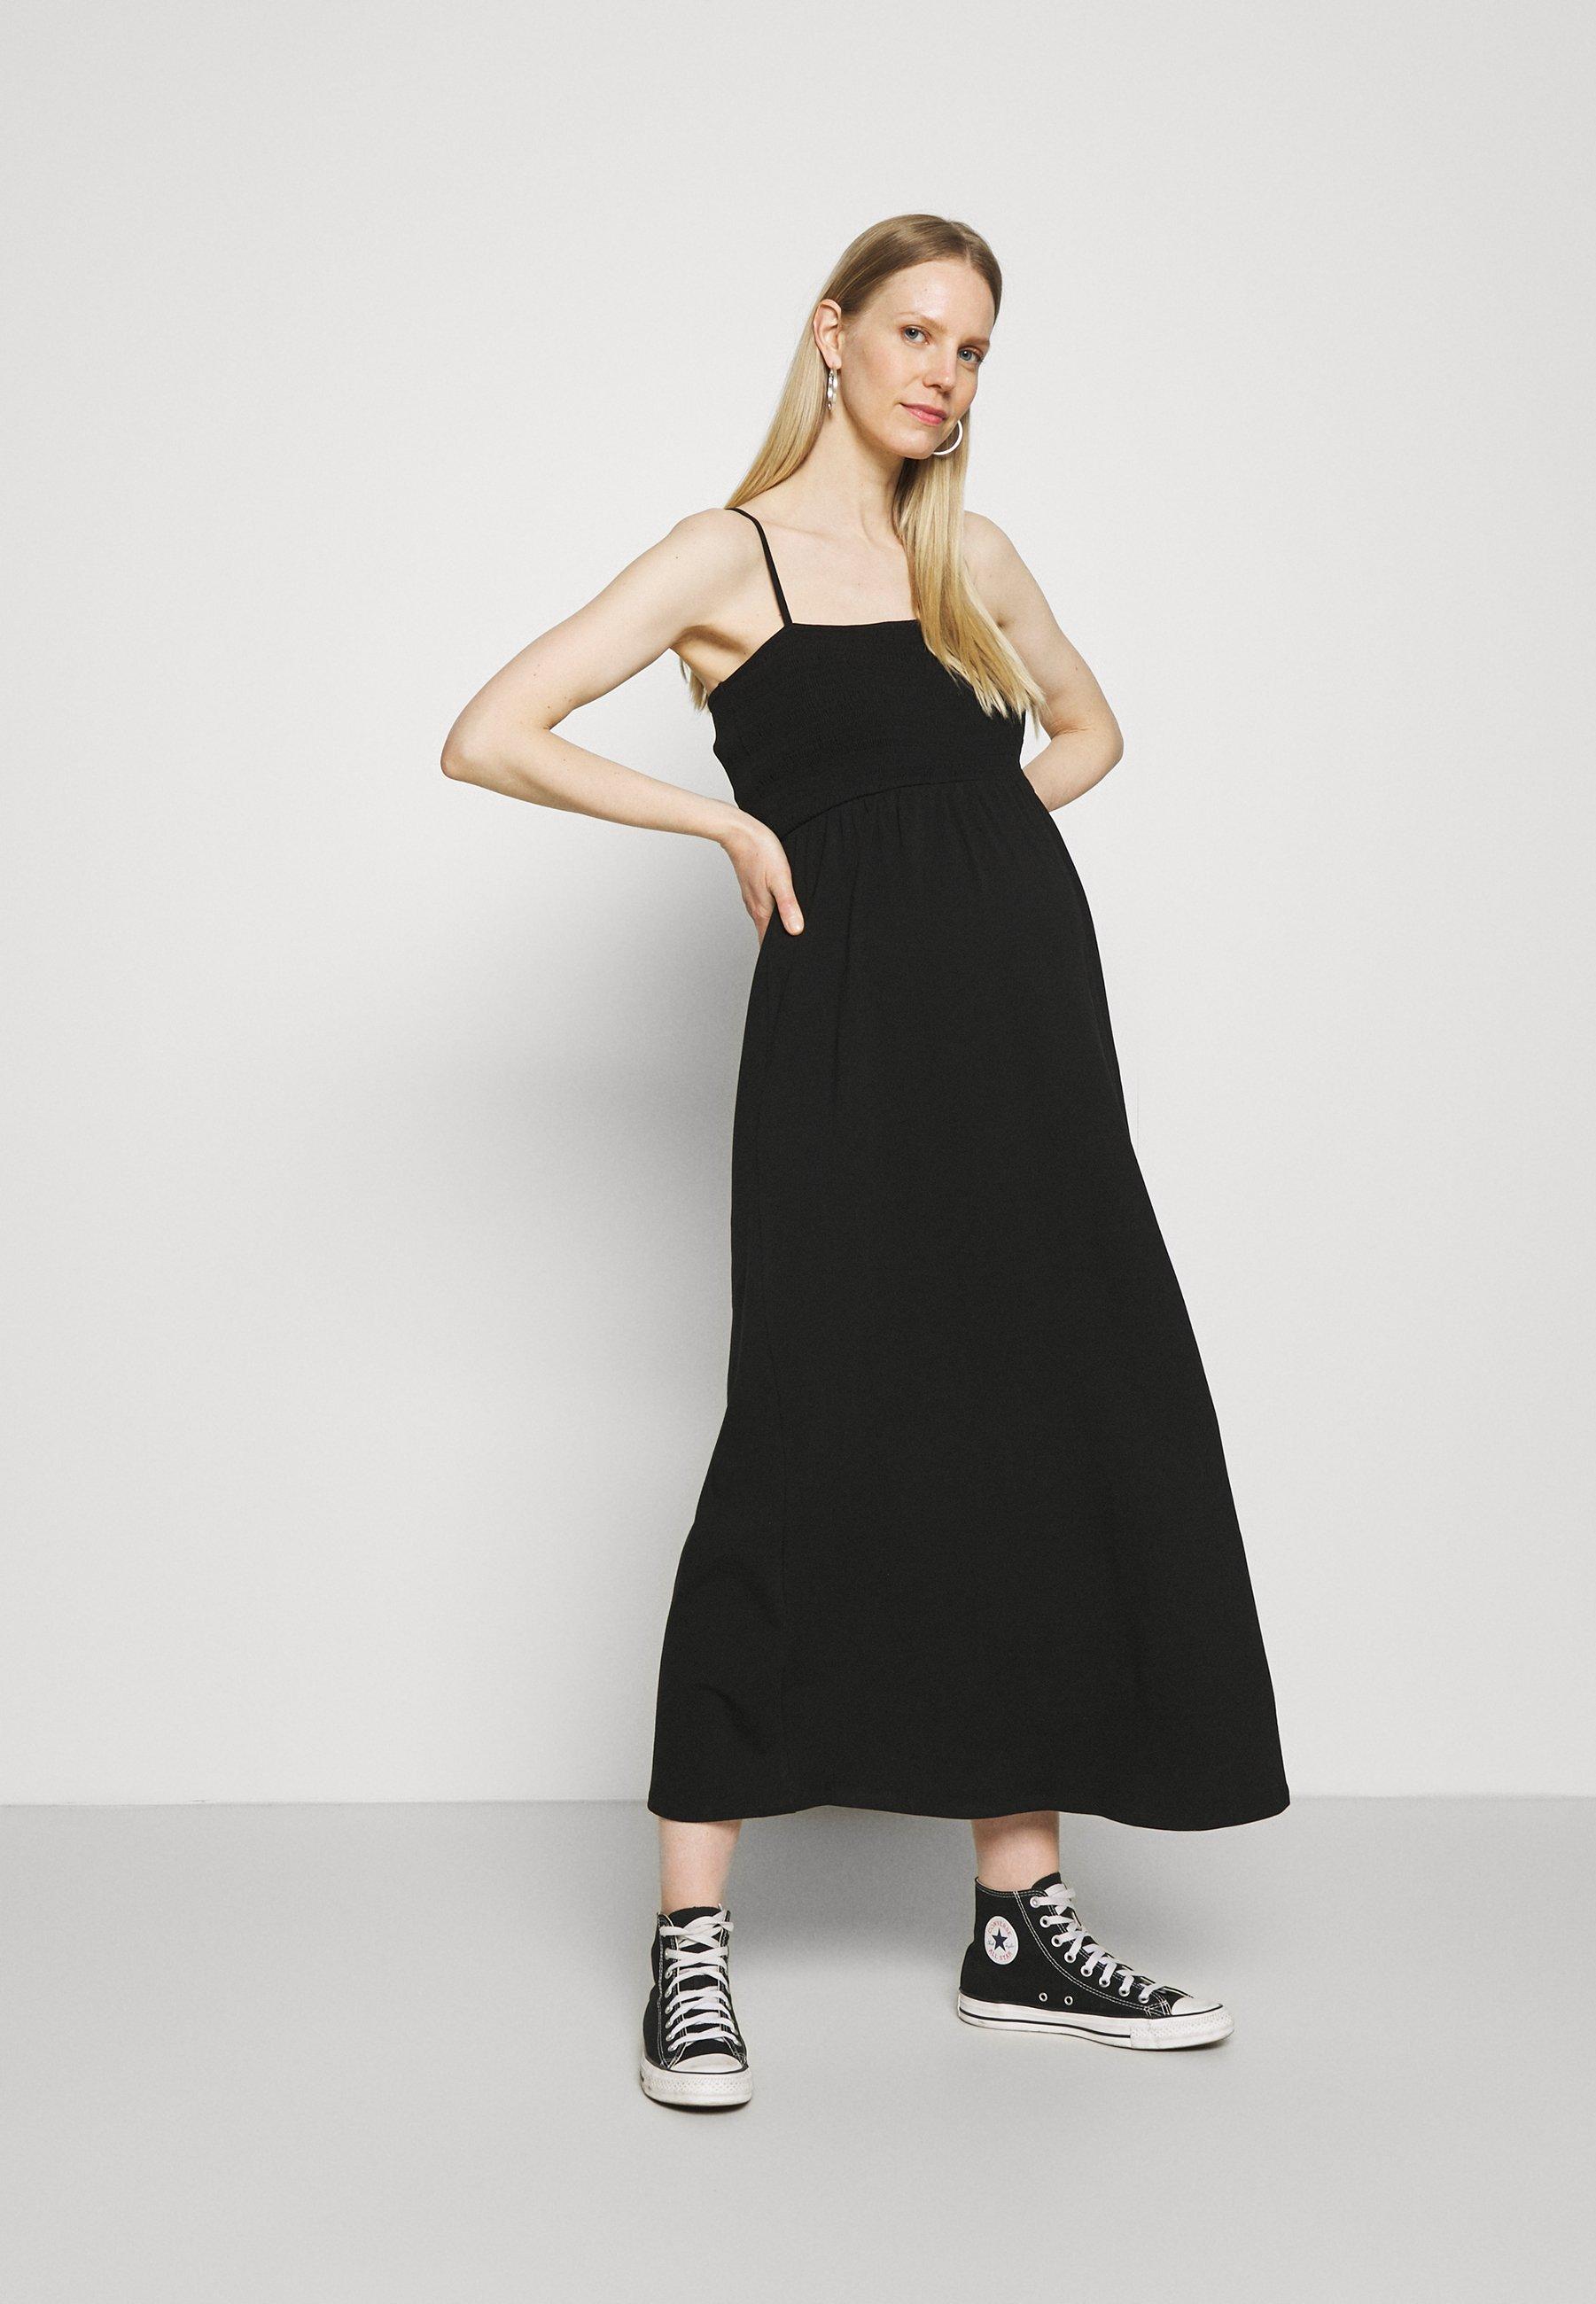 Donna OLMEMMA SMOCK DRESS - Vestito lungo